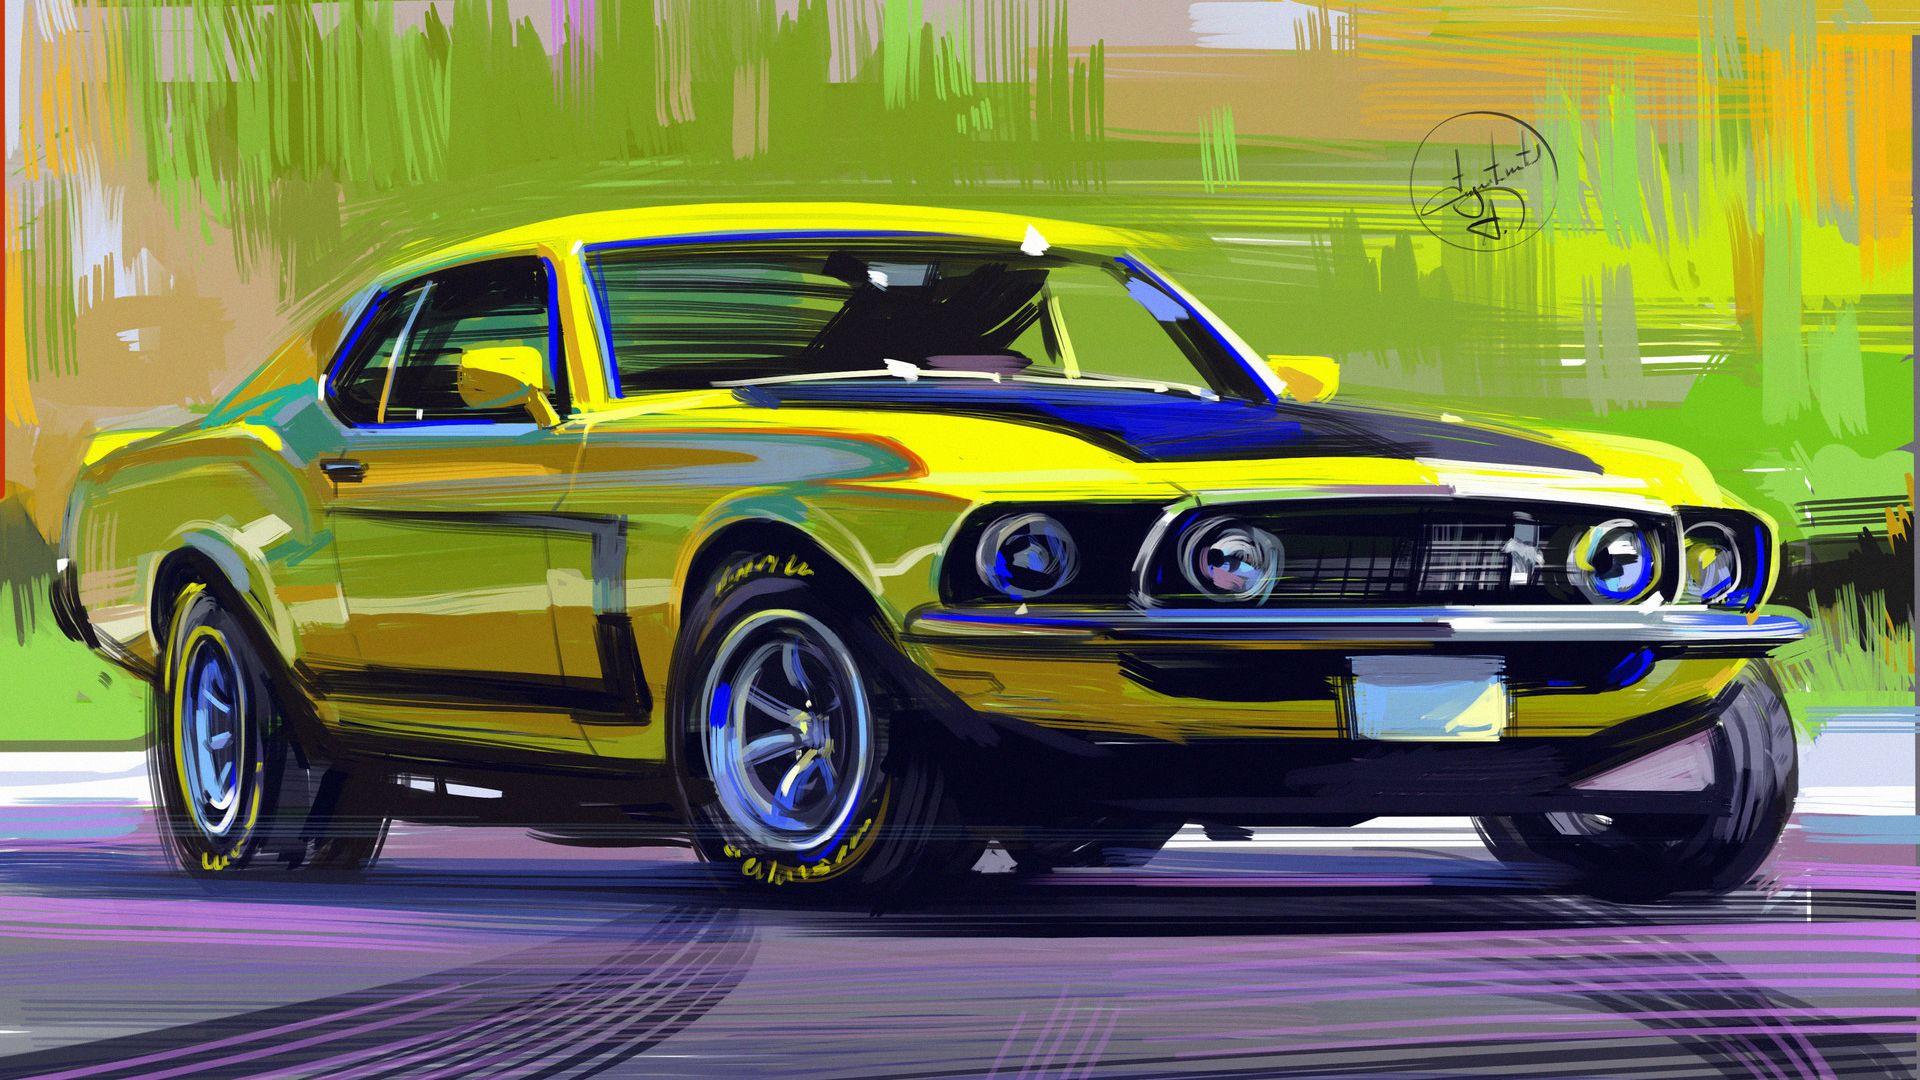 Artwork Vehicle Aleksandr Sidelnikov Digital Art Mustang Car Yellow Cars Ford Mustang 1920x1080 Automotive Illustration Art Cars 1920x1080 Wallpaper